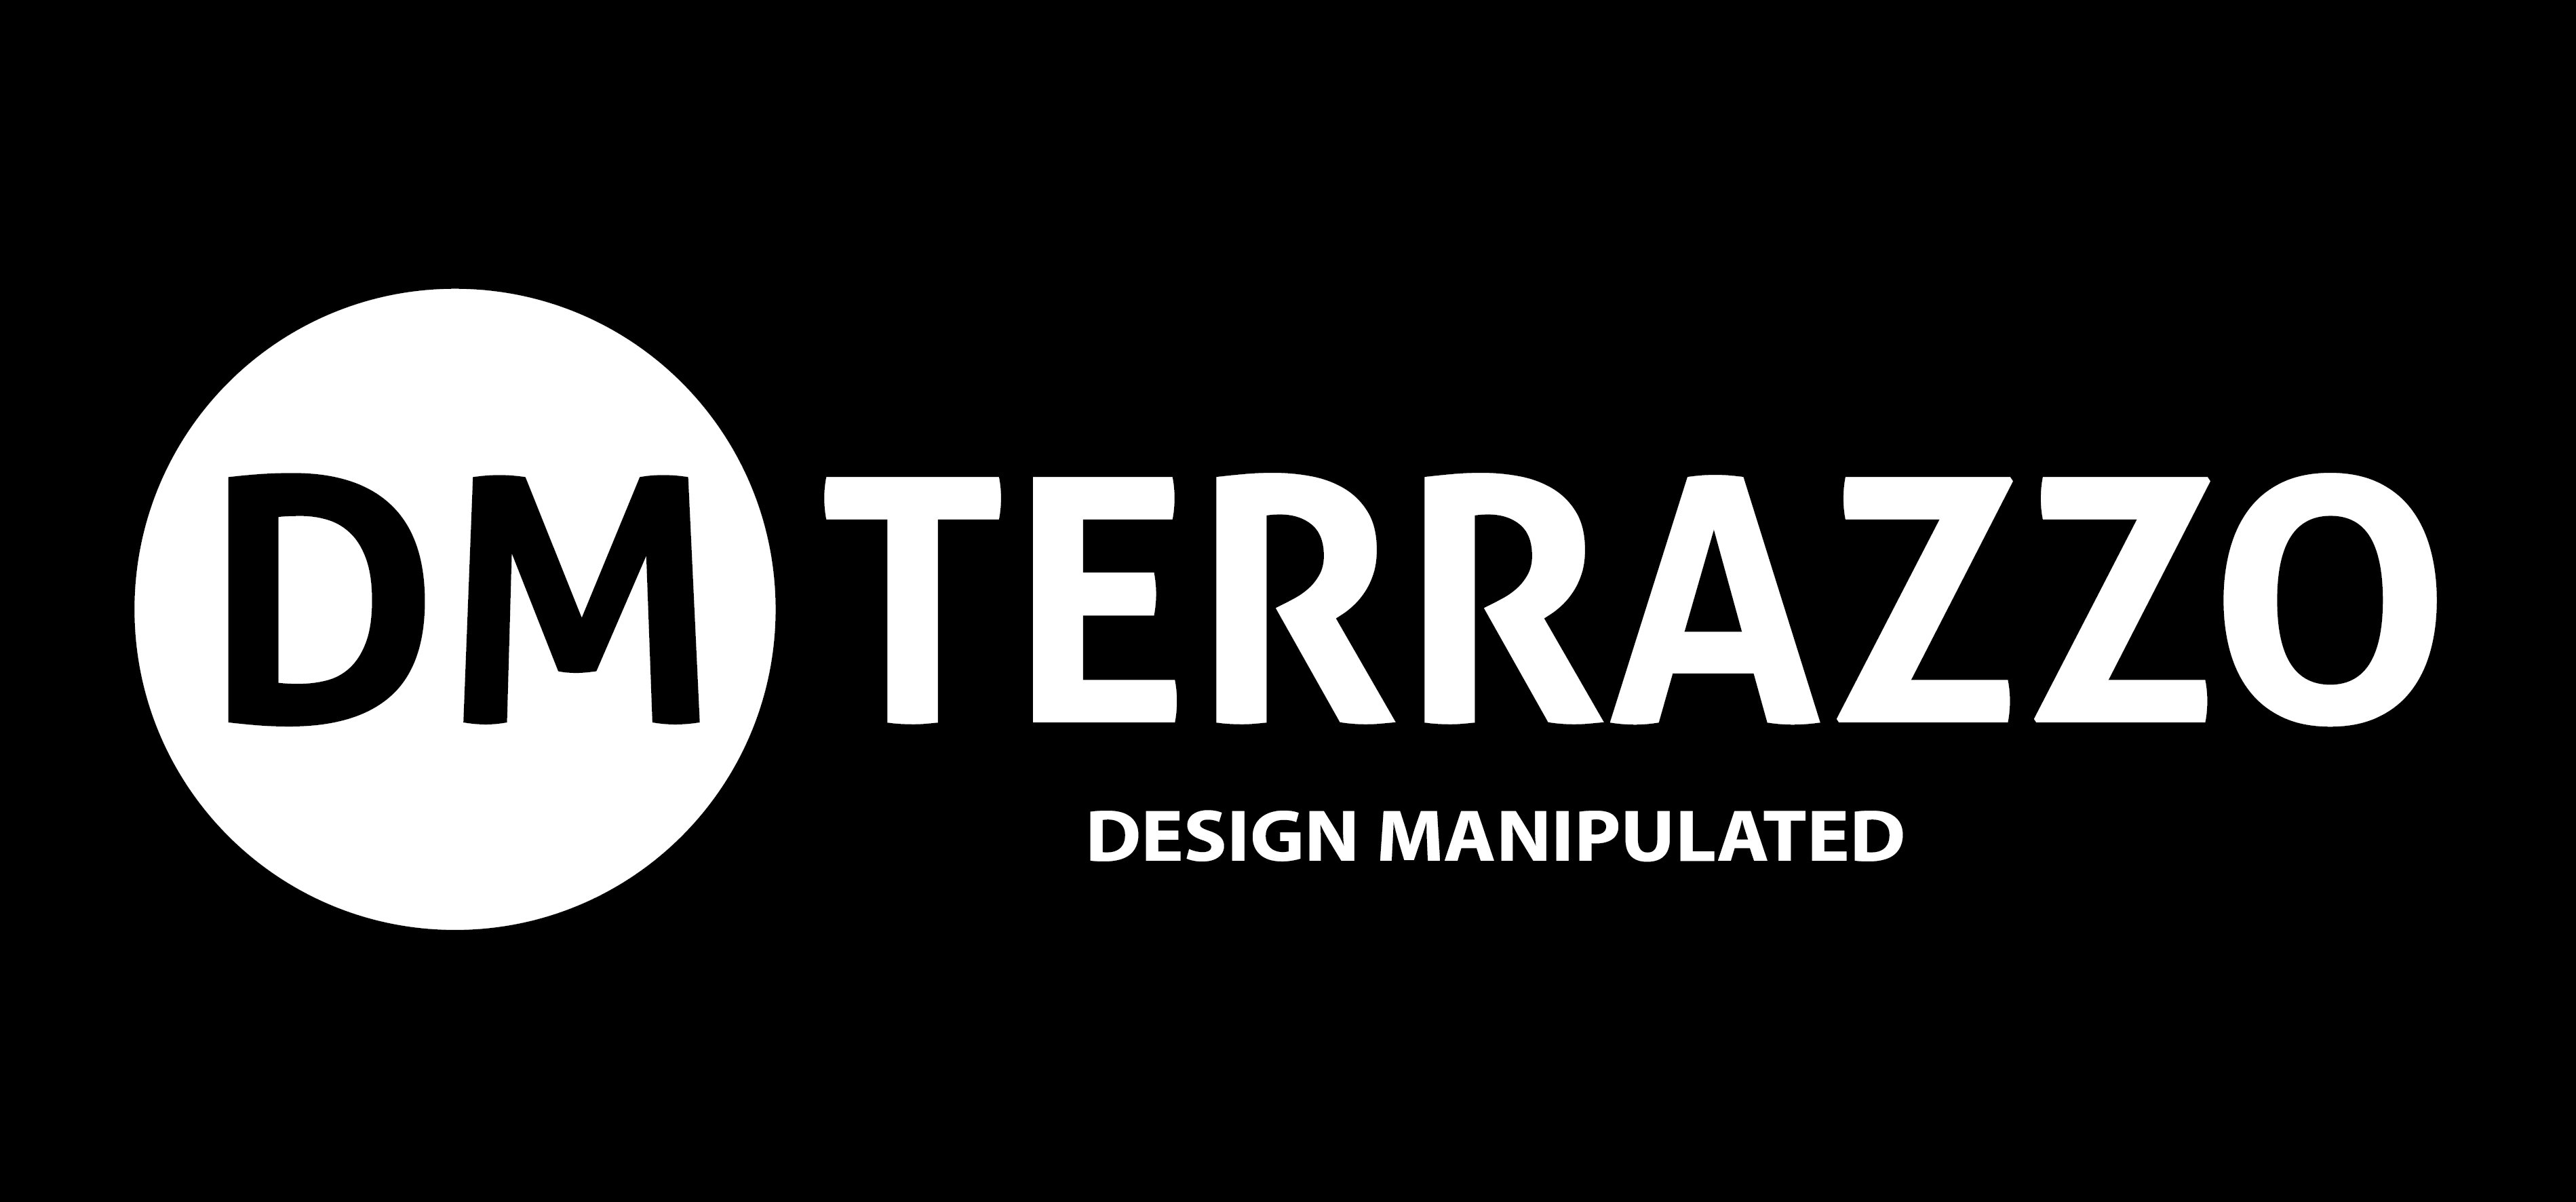 DM Terrazzo